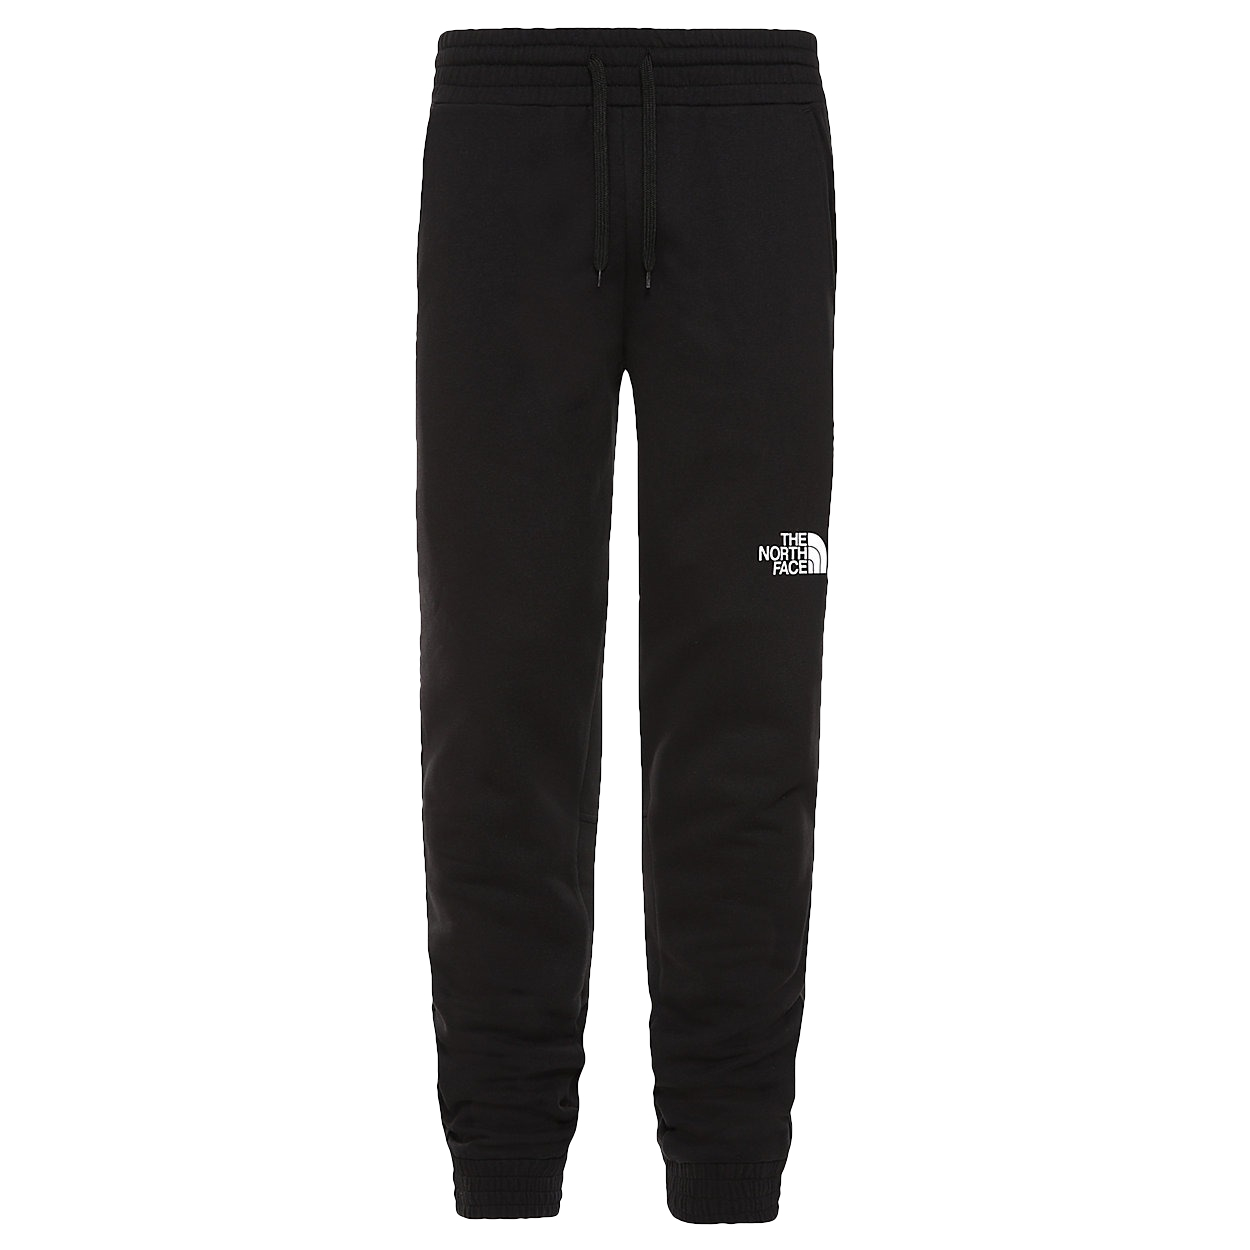 Спортивные брюки The North Face Standard, tnf black, S фото